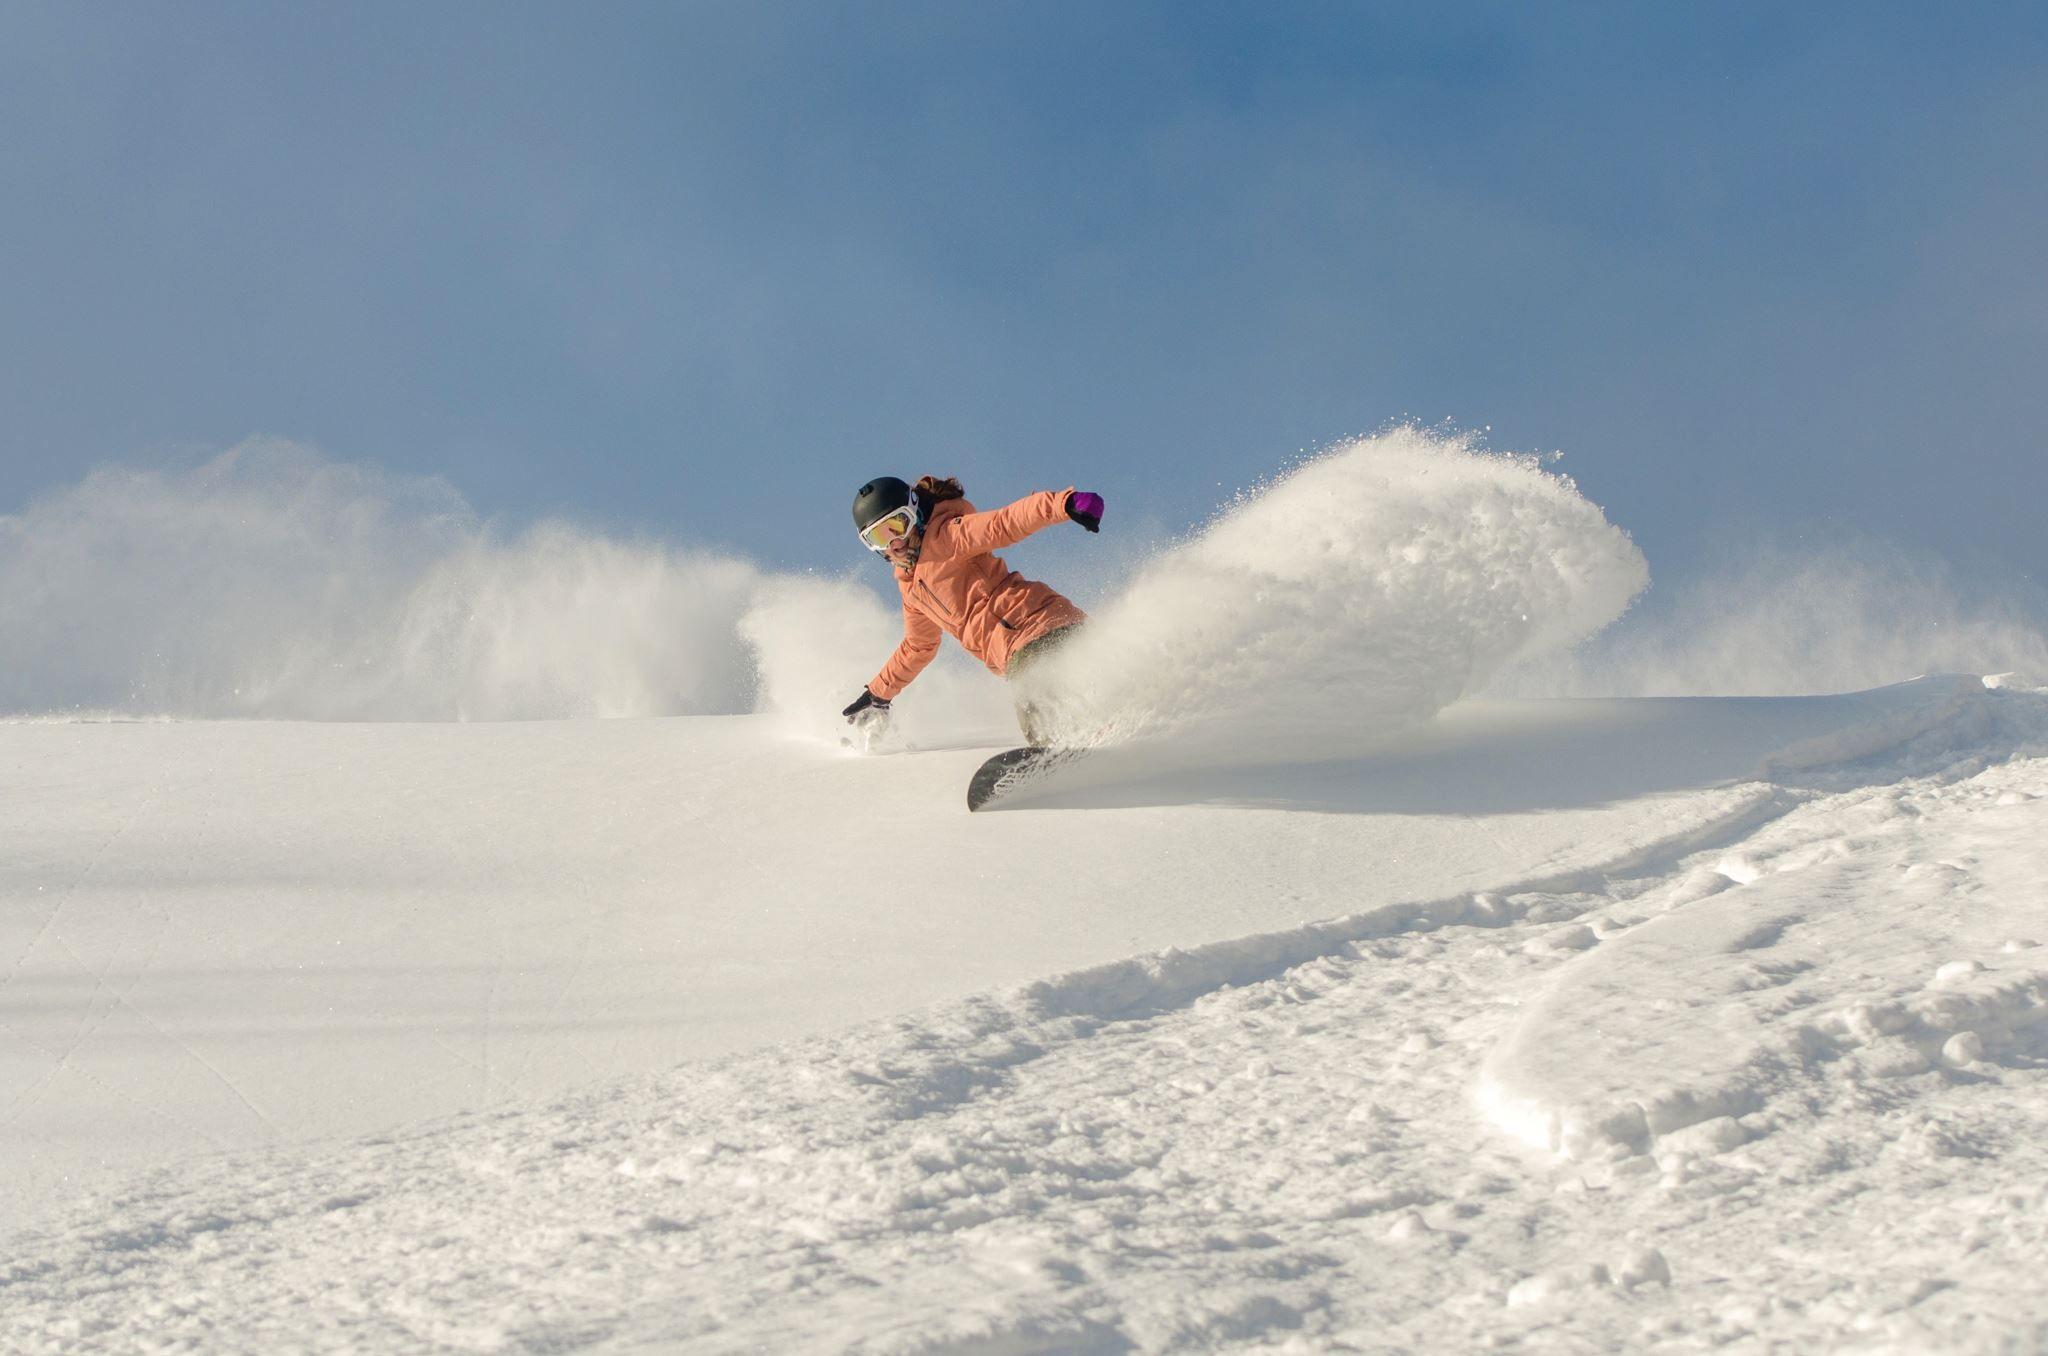 Powder Snowboarding, Snowboard, Skiing